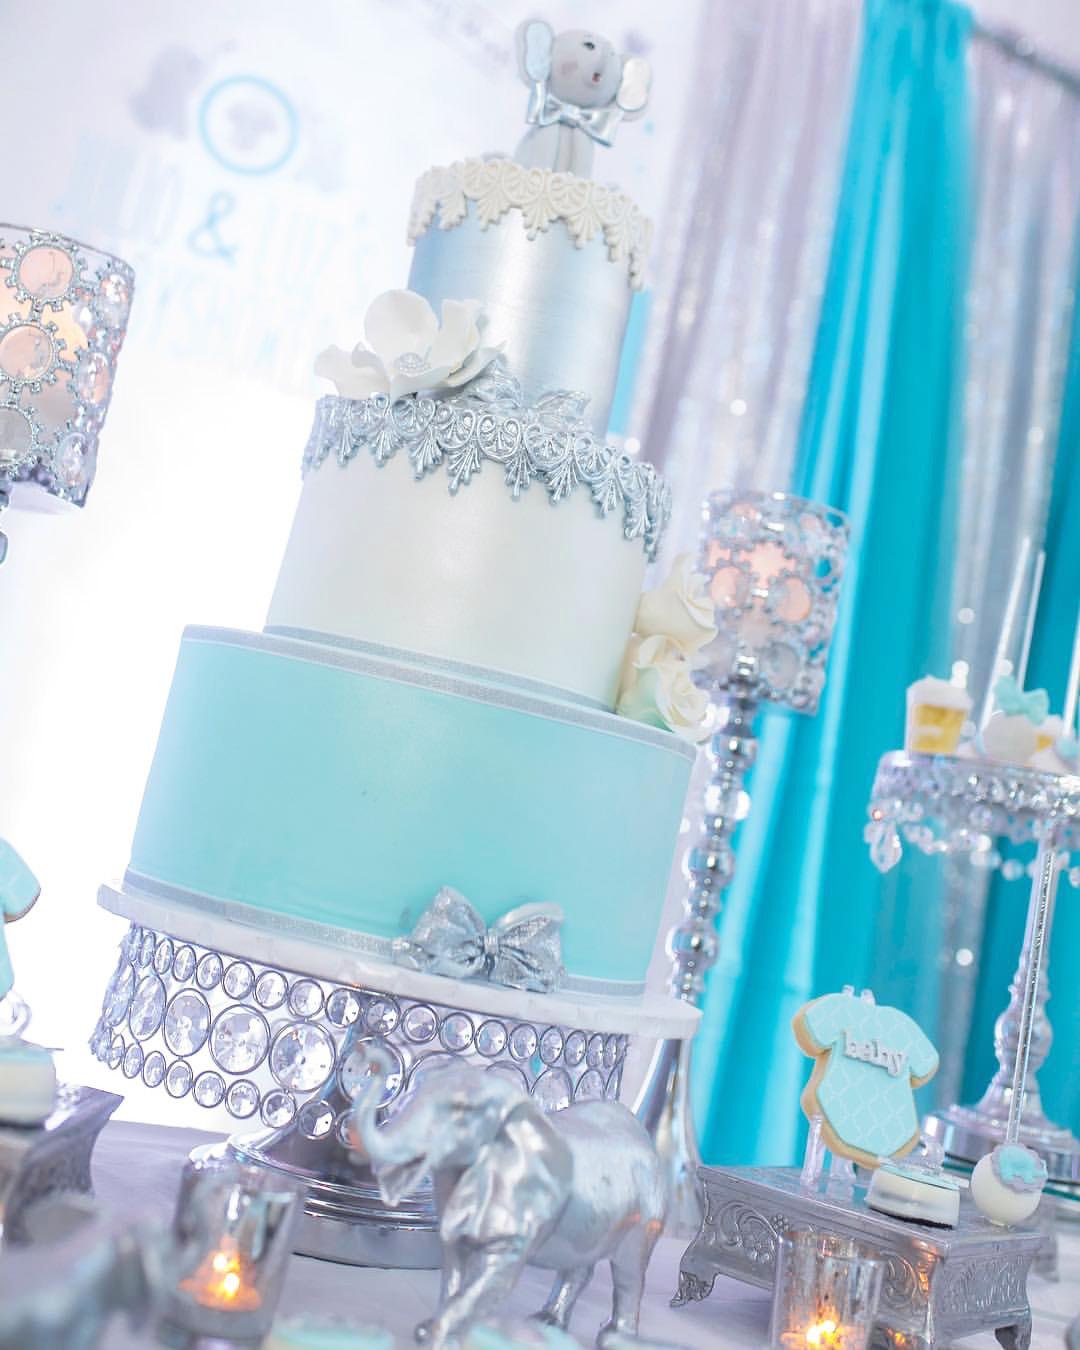 shiny silver bling cake stand opulent treasures.jpg